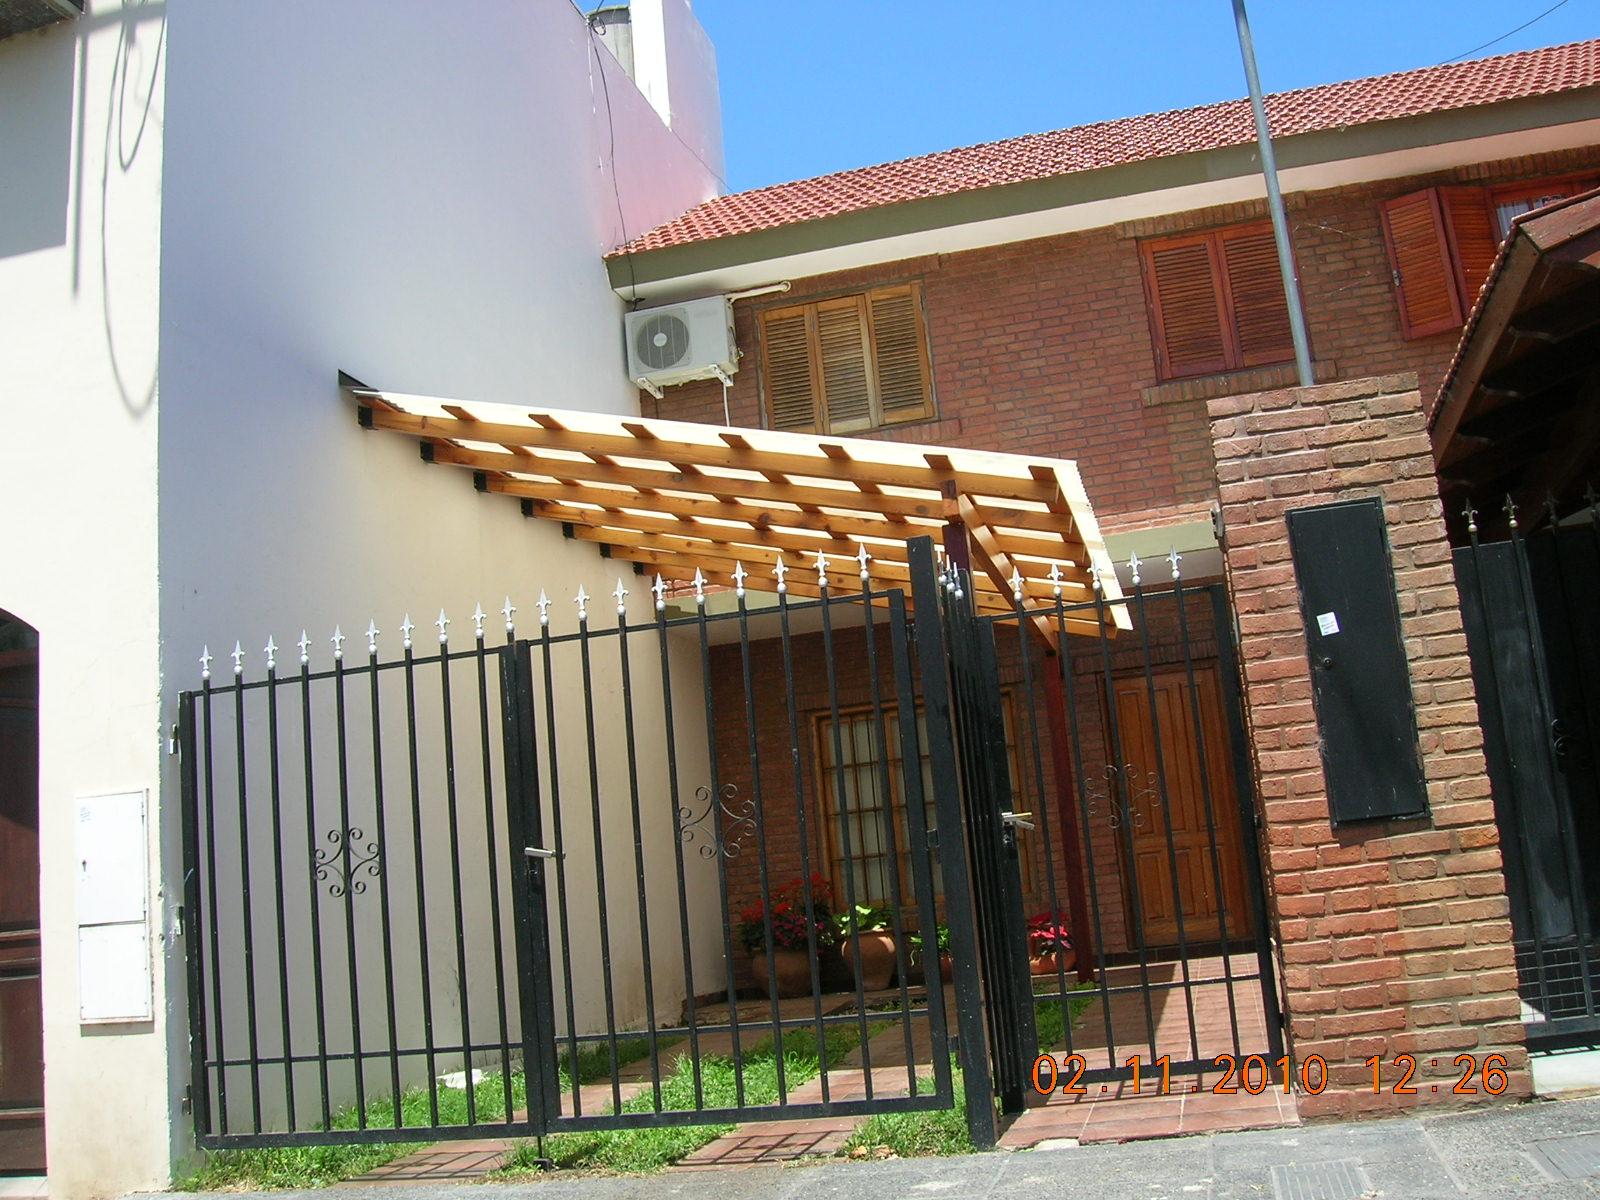 Pergolas decks cochera techo trasl cido for Cocheras de madera precios